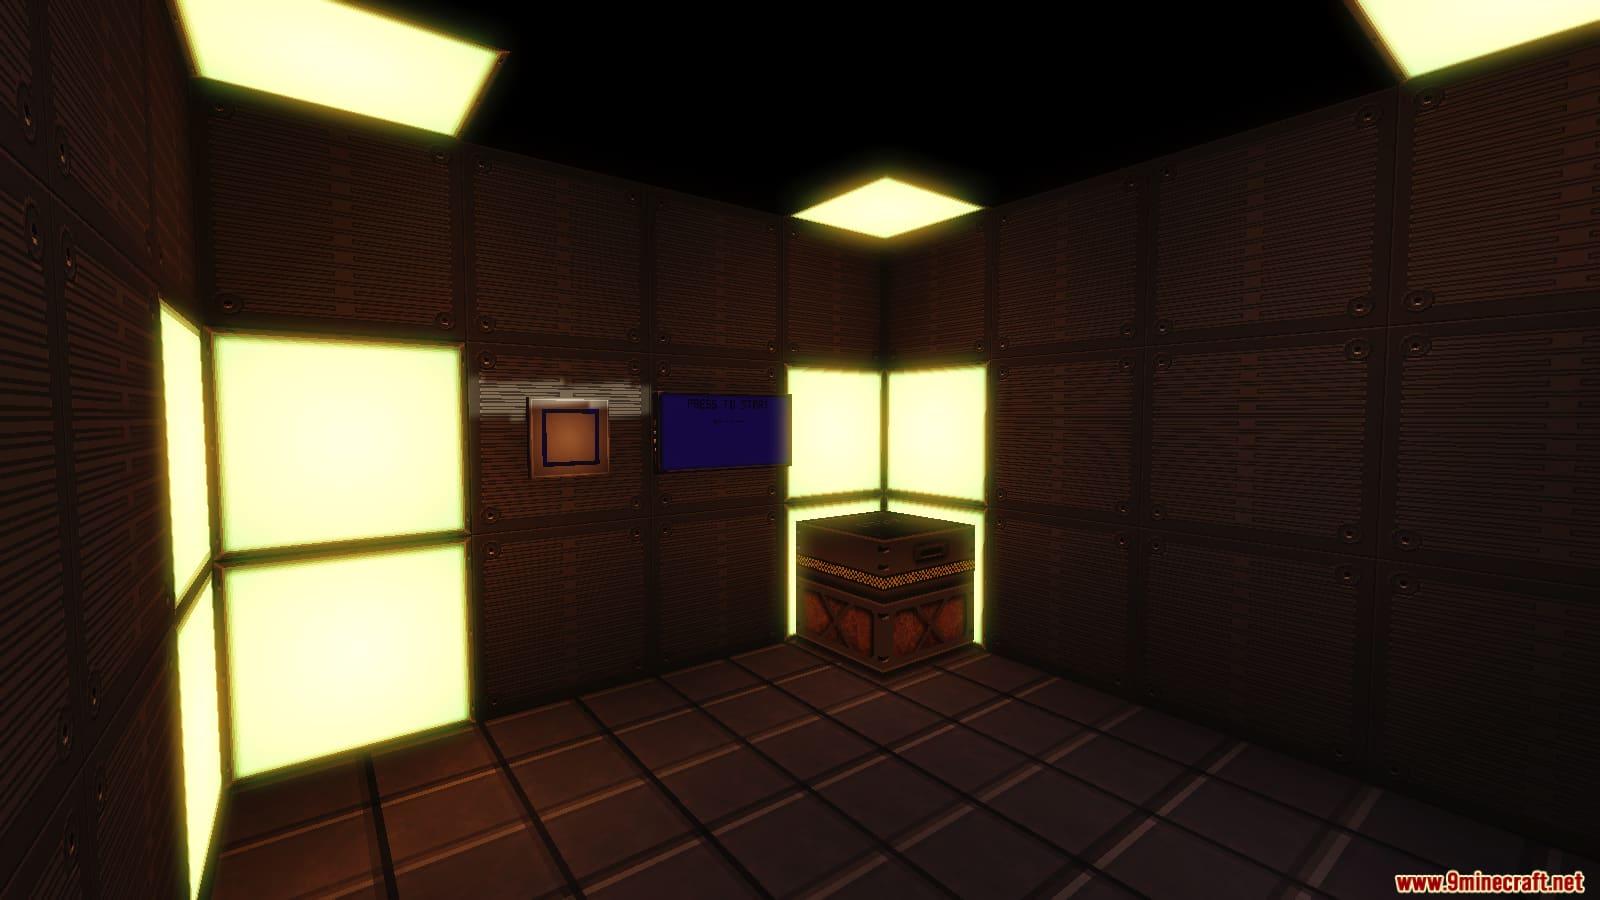 Mapa de System Shock 2 Capturas de pantalla 1